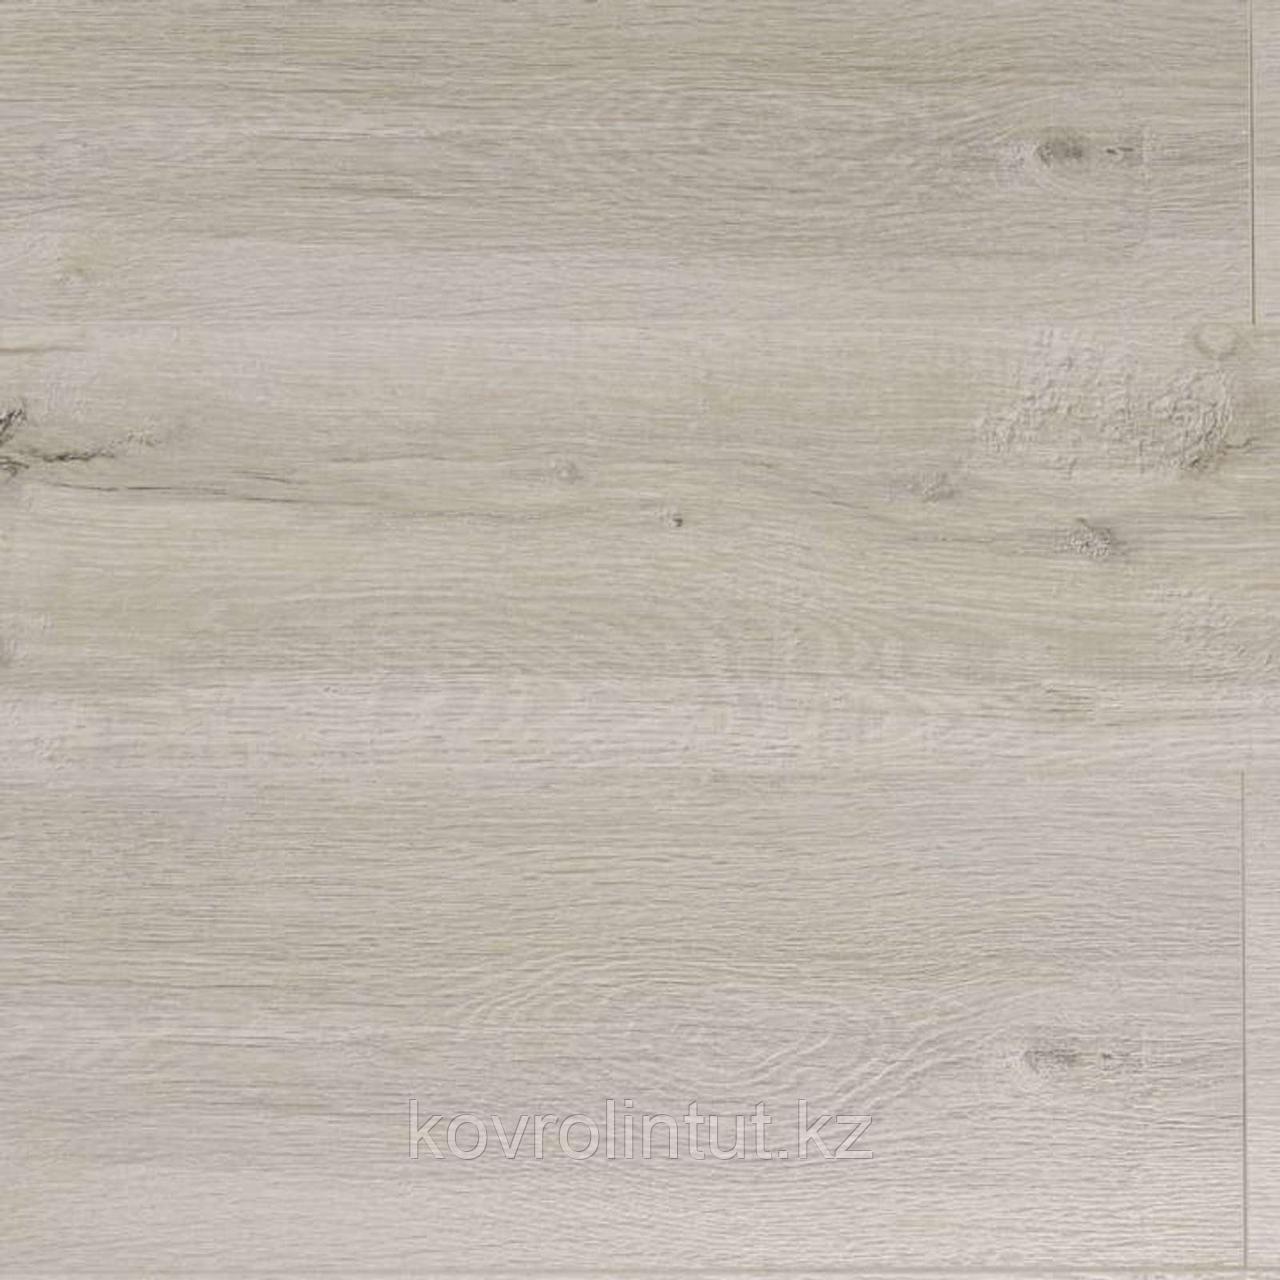 Ламинат Sommer коллекция Nordica Дуб Готланд 1 кл 504486000, 194х1292х8мм, 32кл (8 шт/2,005м2)